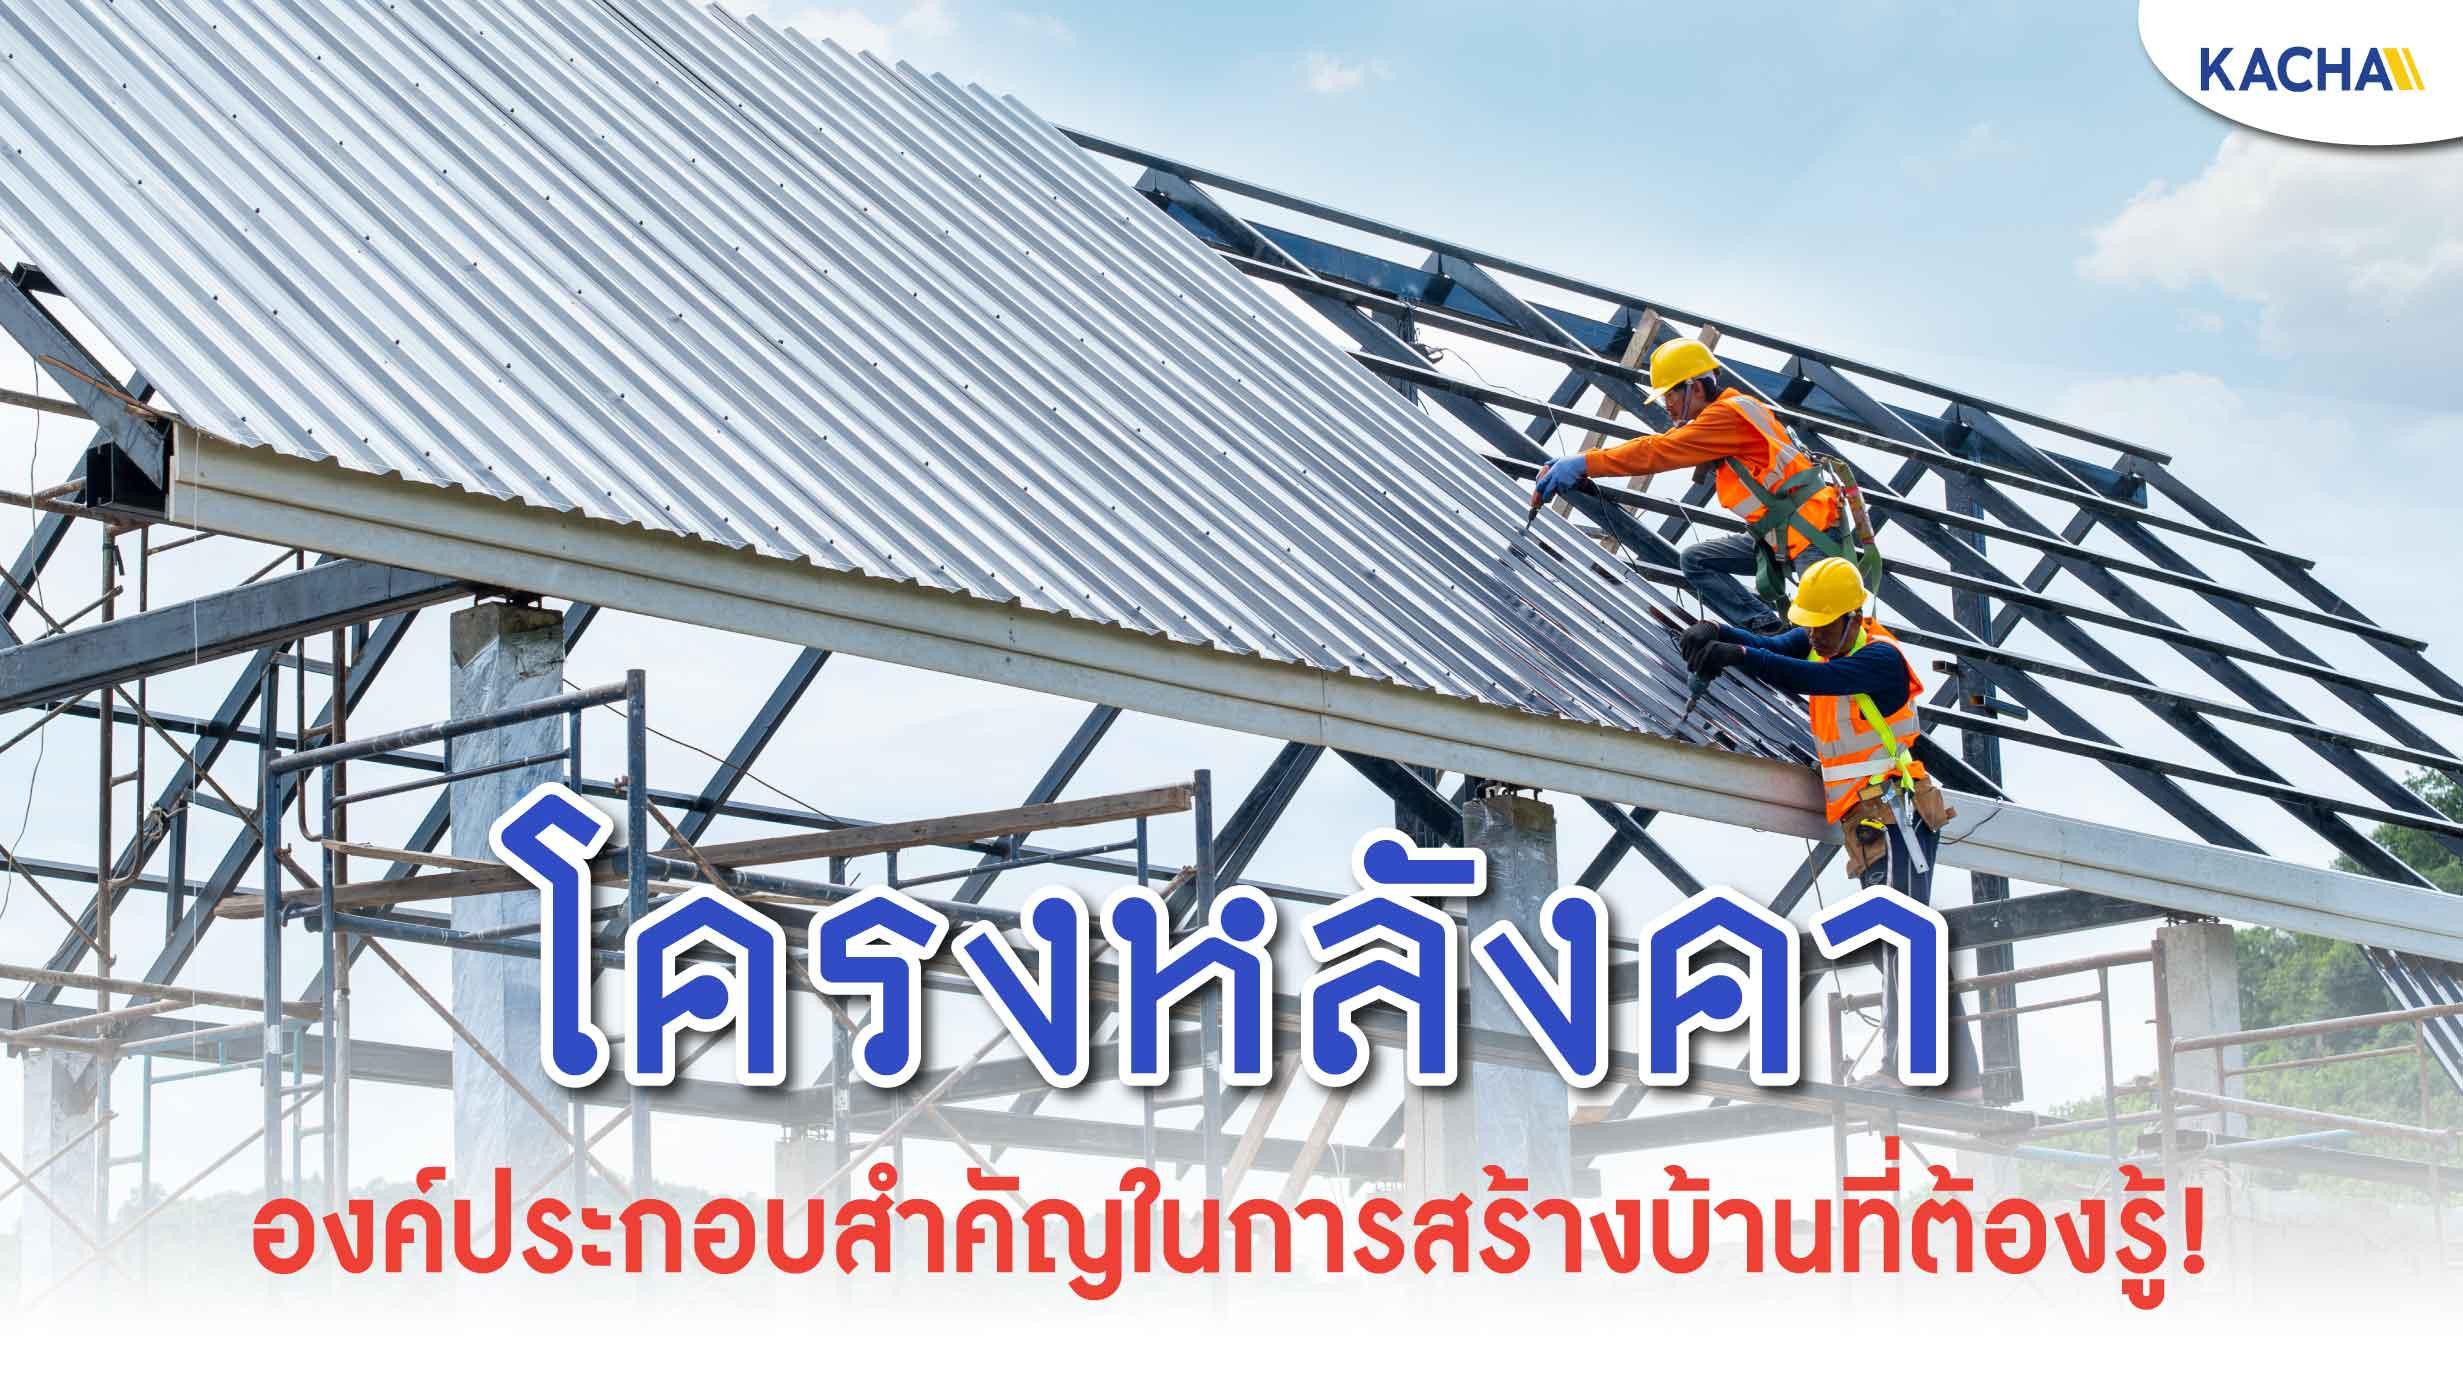 210916-Content-โครงหลังคา-องค์ประกอบสำคัญในการสร้างบ้านที่ต้องรู้!01